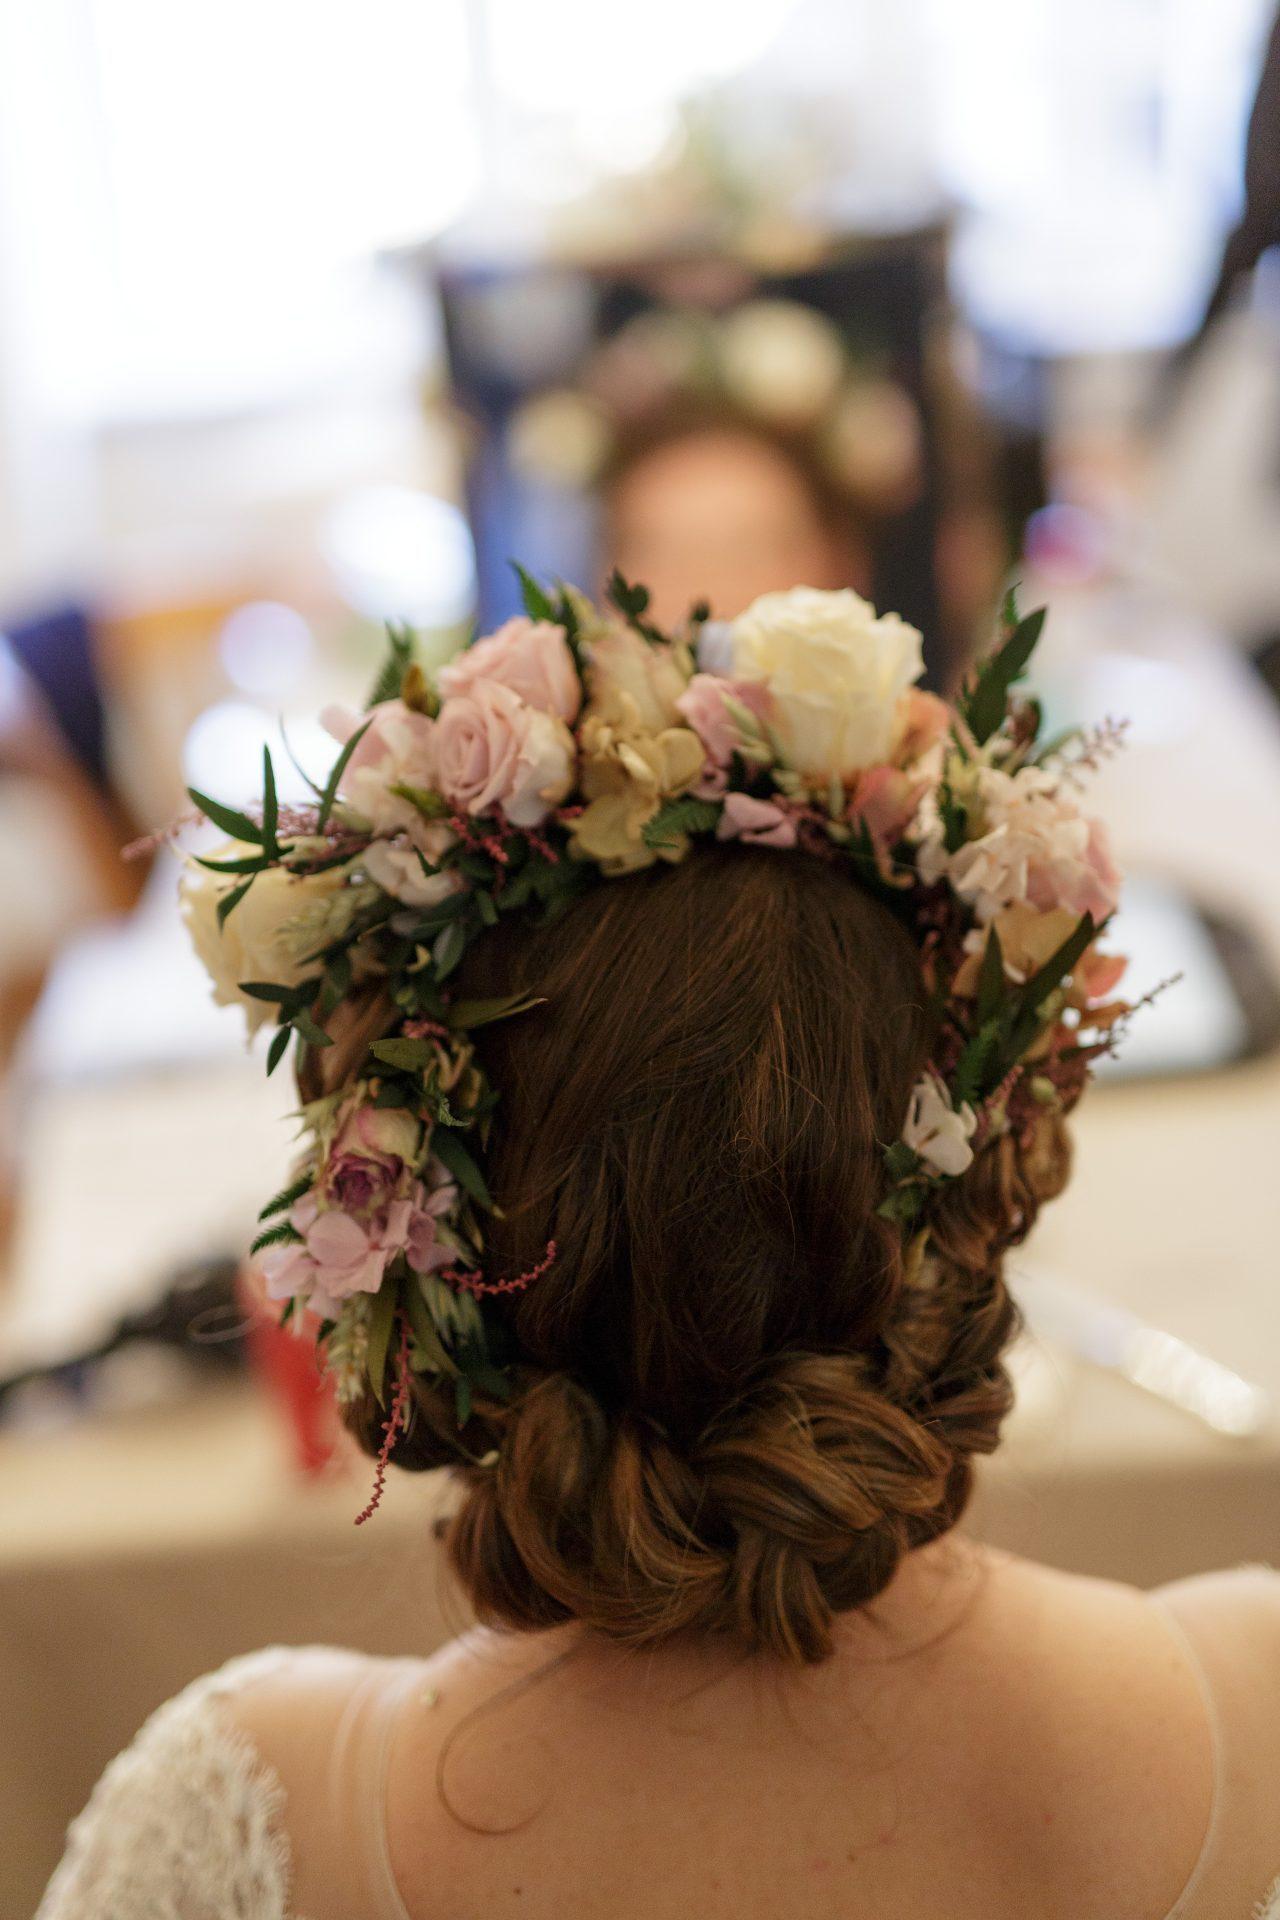 Half Up Wedding Hairstyles Plaits Braids Wedding Make Up And